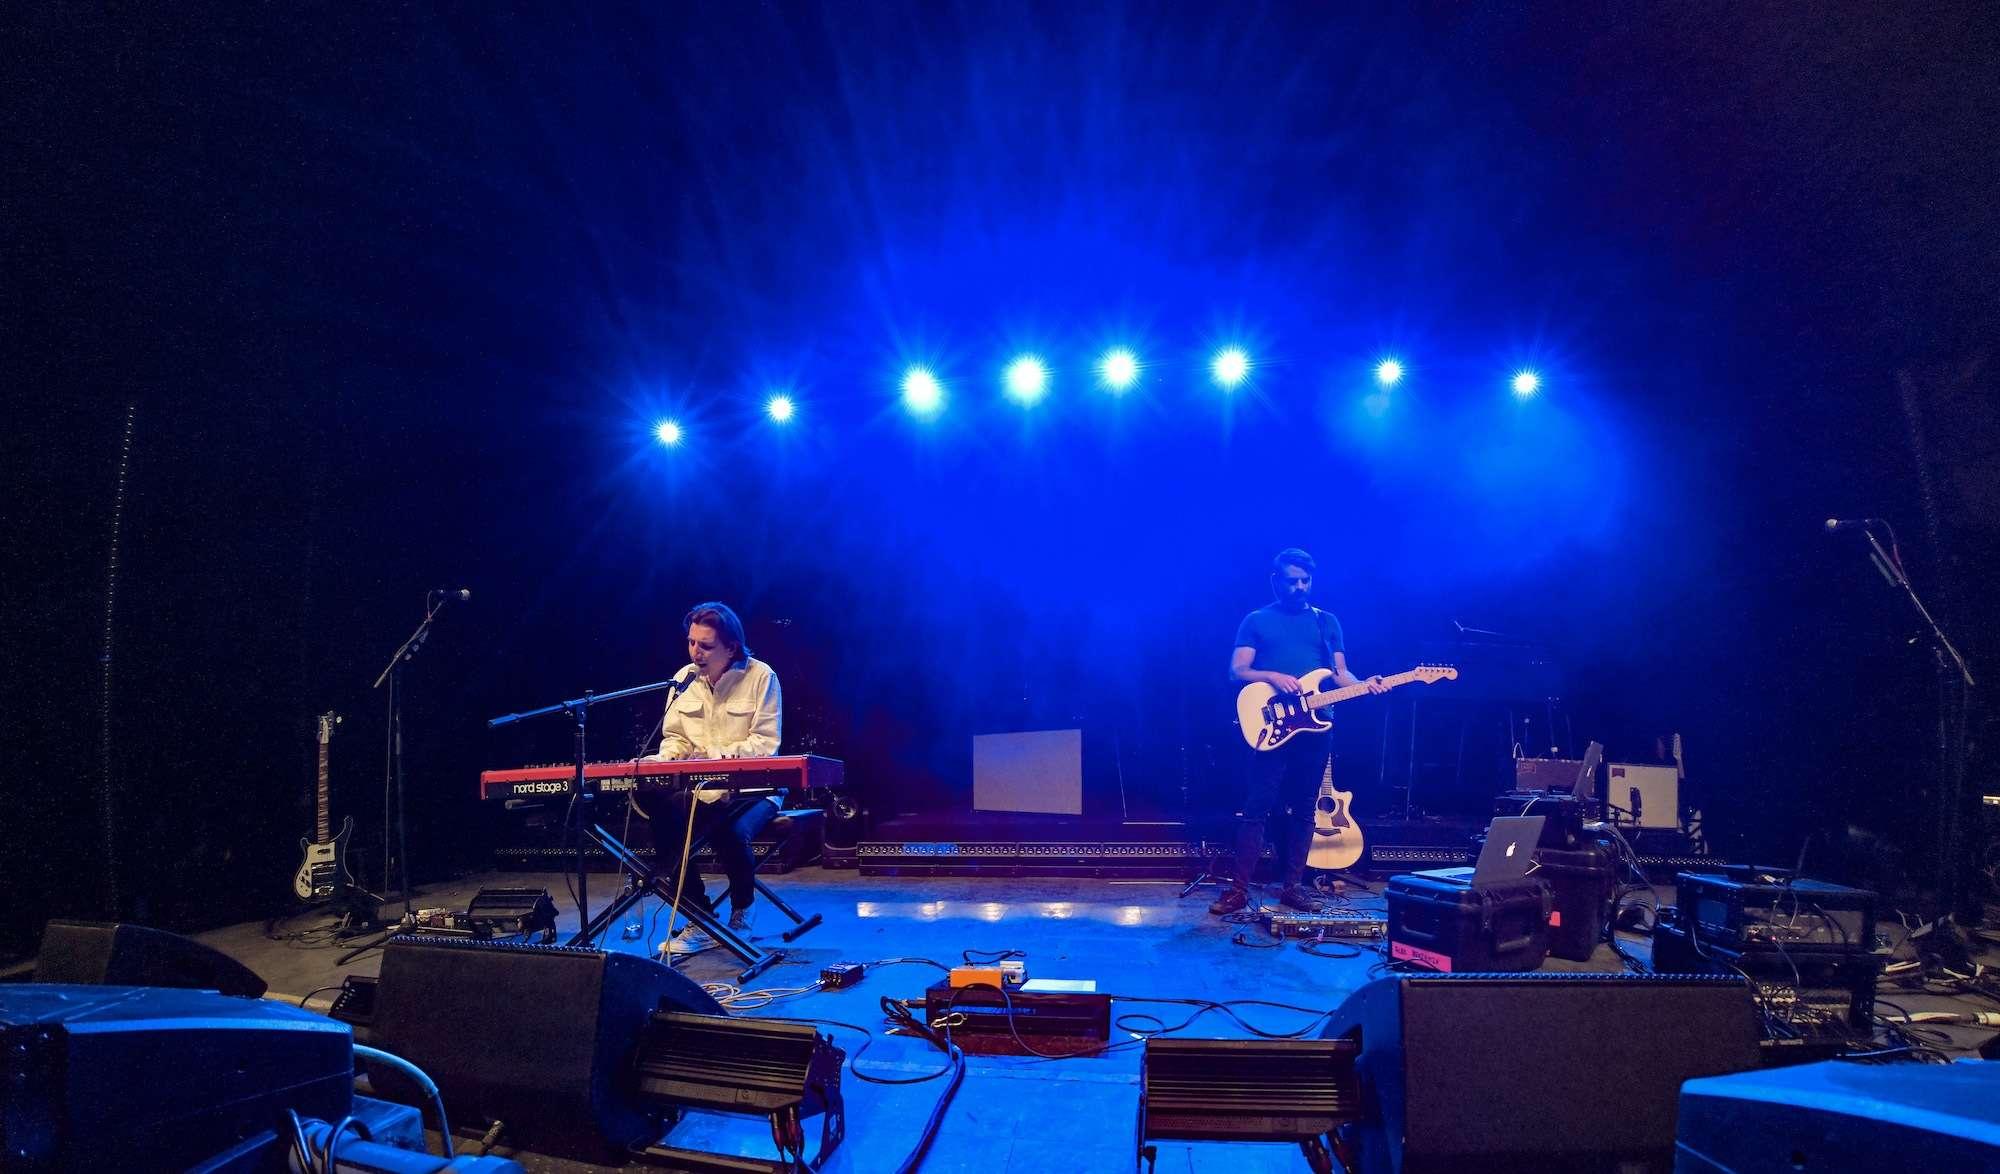 Anson Seabra Live at Riviera [GALLERY] 13